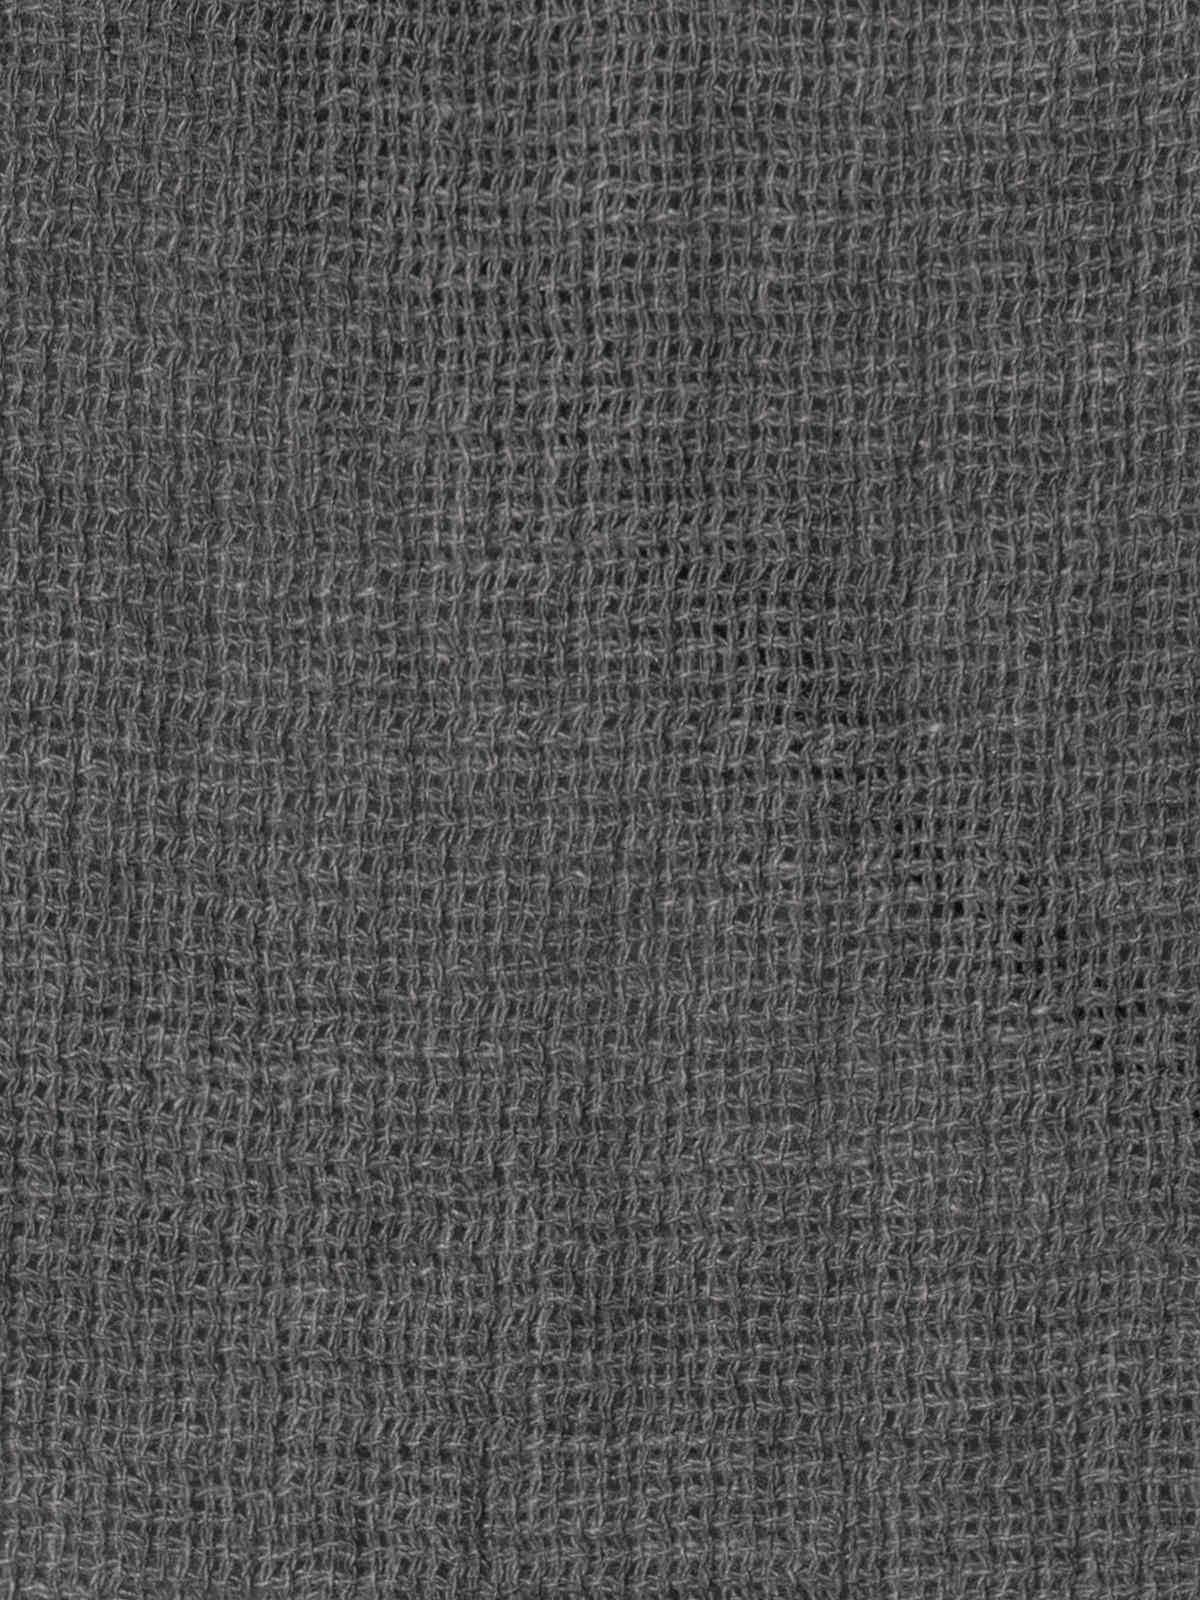 Woman Cotton polo shirt and linen detail Grey